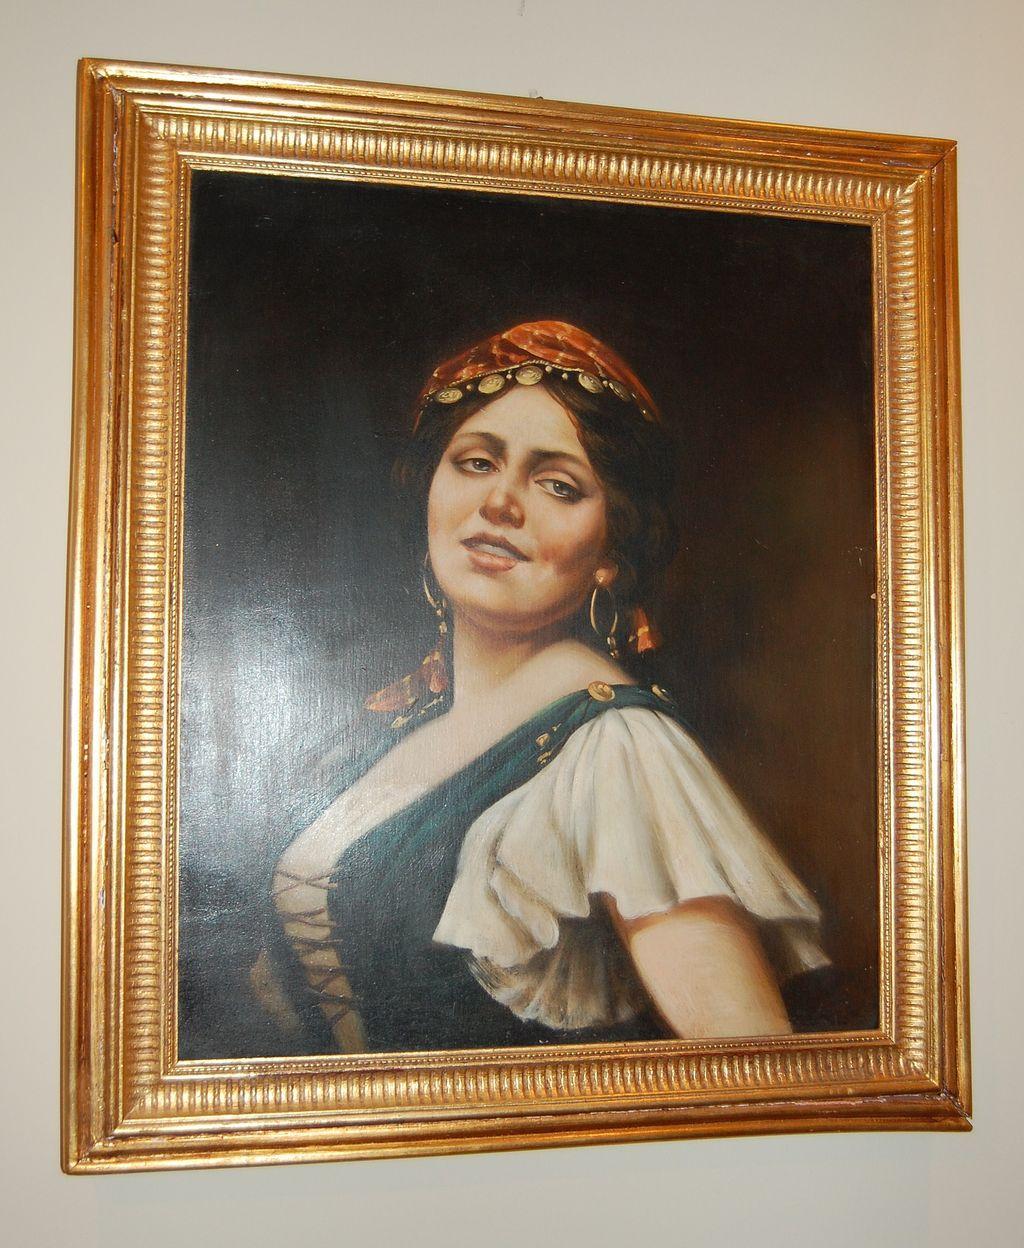 1900s Italian Gypsy Oil Painting In Original Gilt Frame